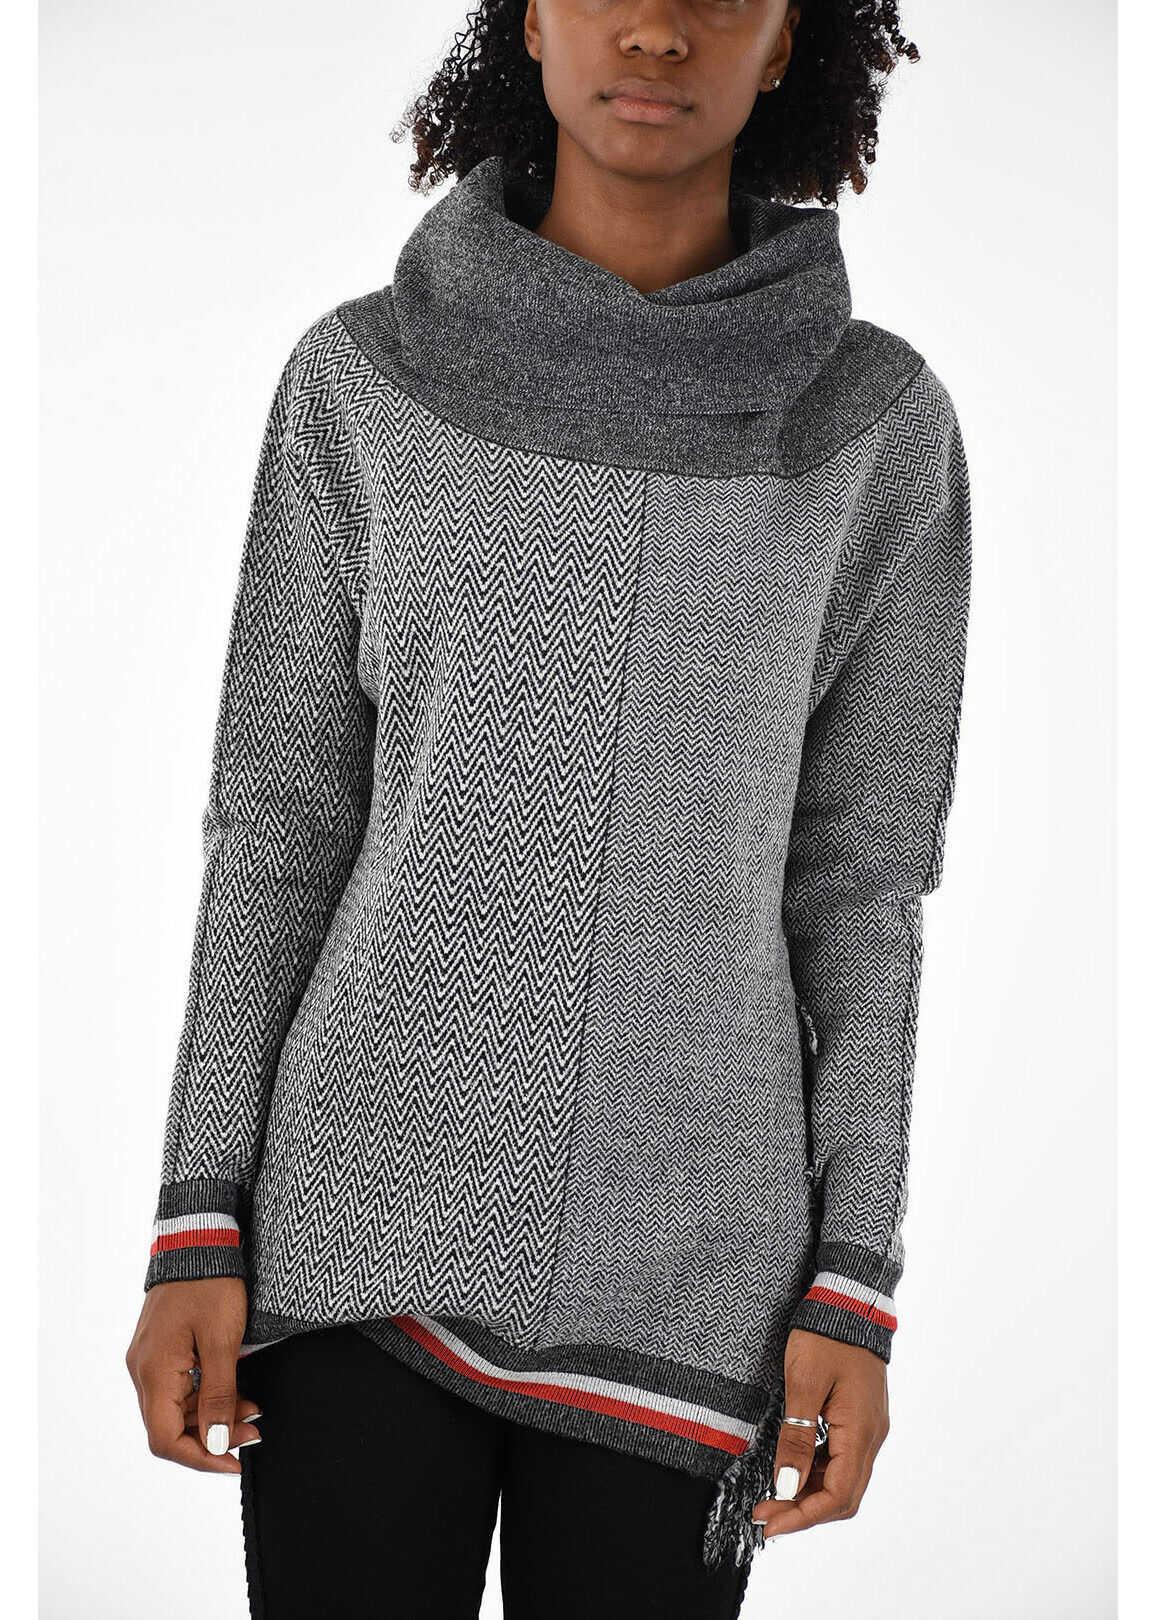 adidas by Stella McCartney Fringed Sweater GRAY